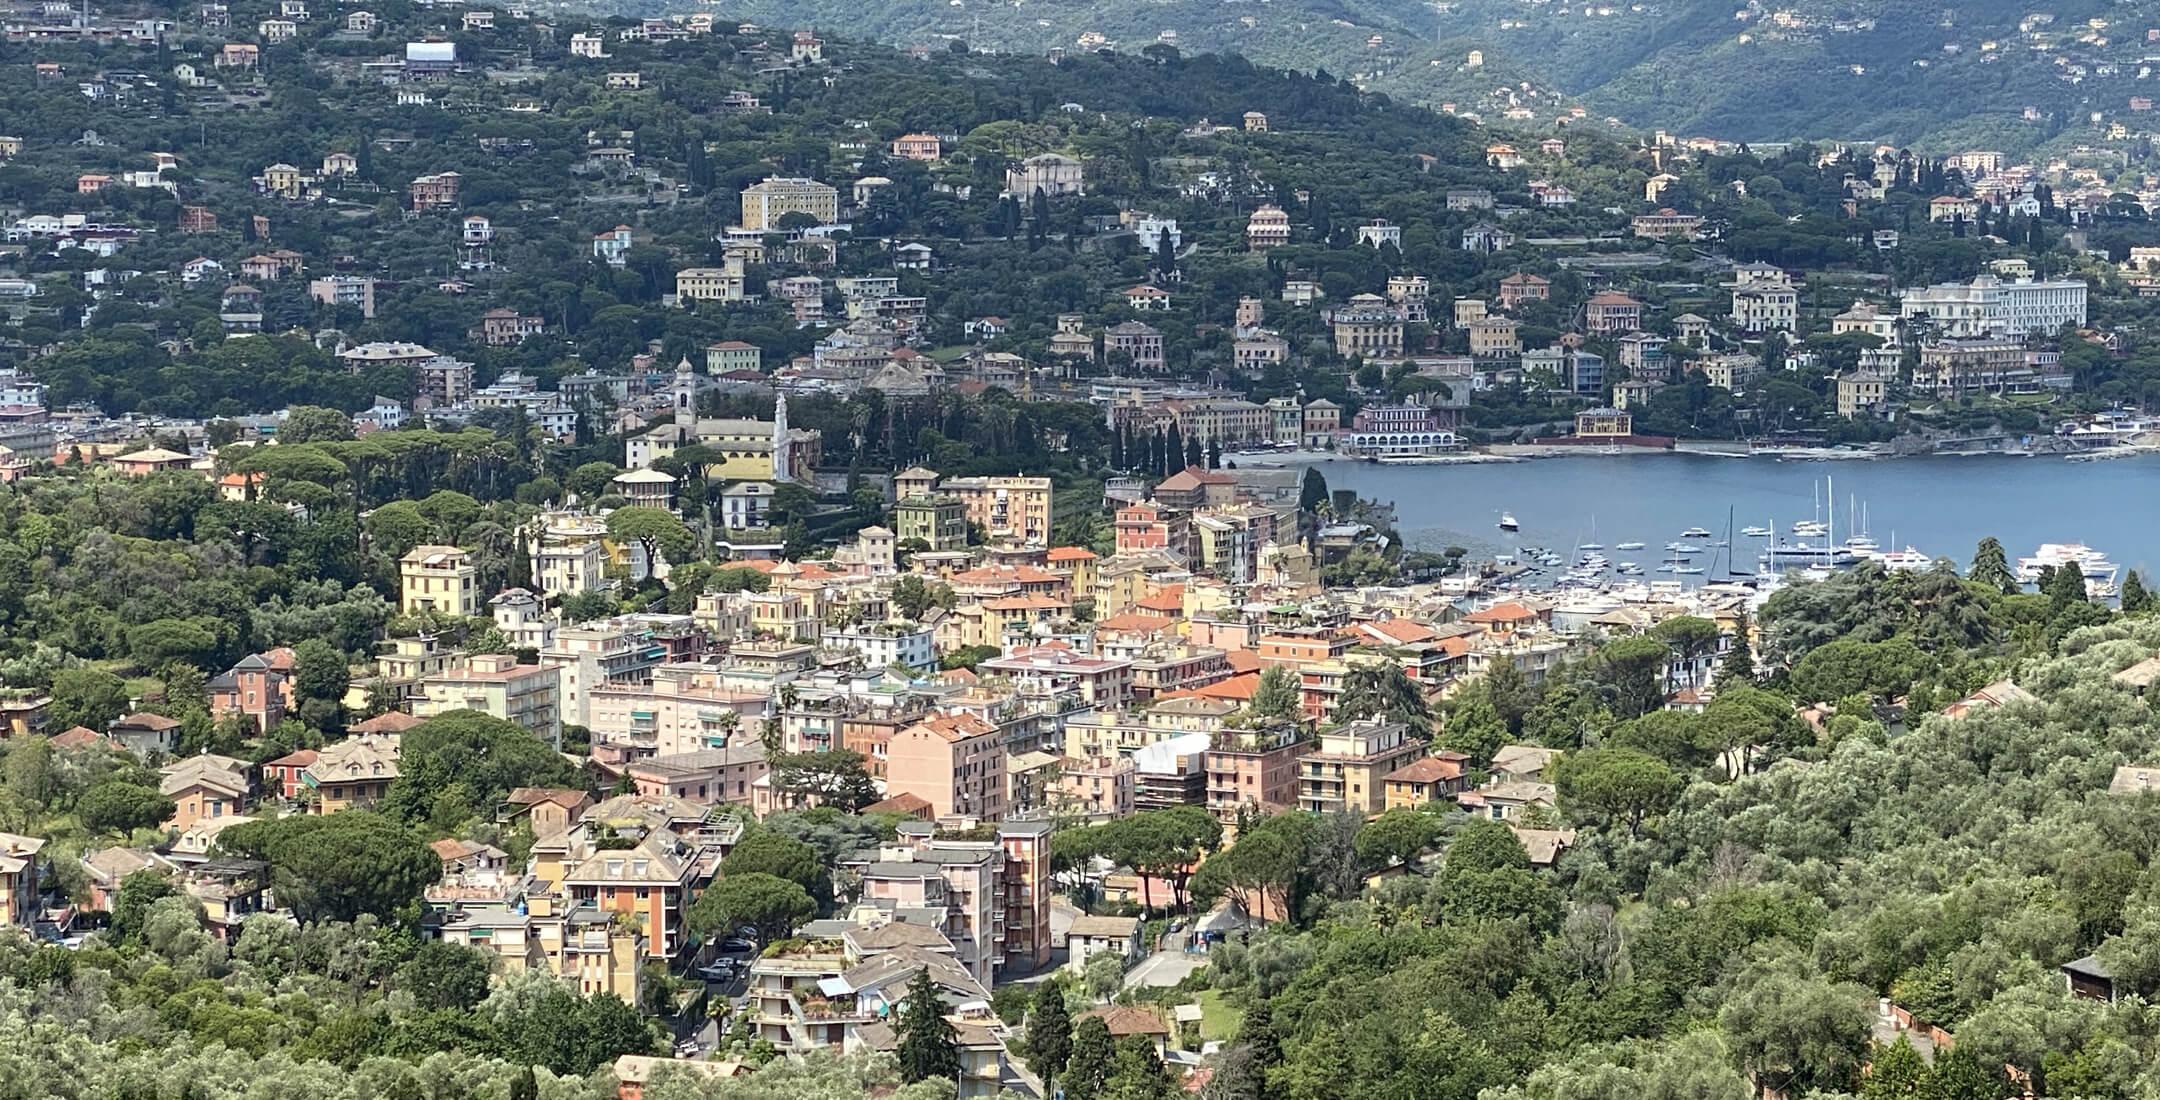 Vista di Santa Margherita Ligure (Nozarego)